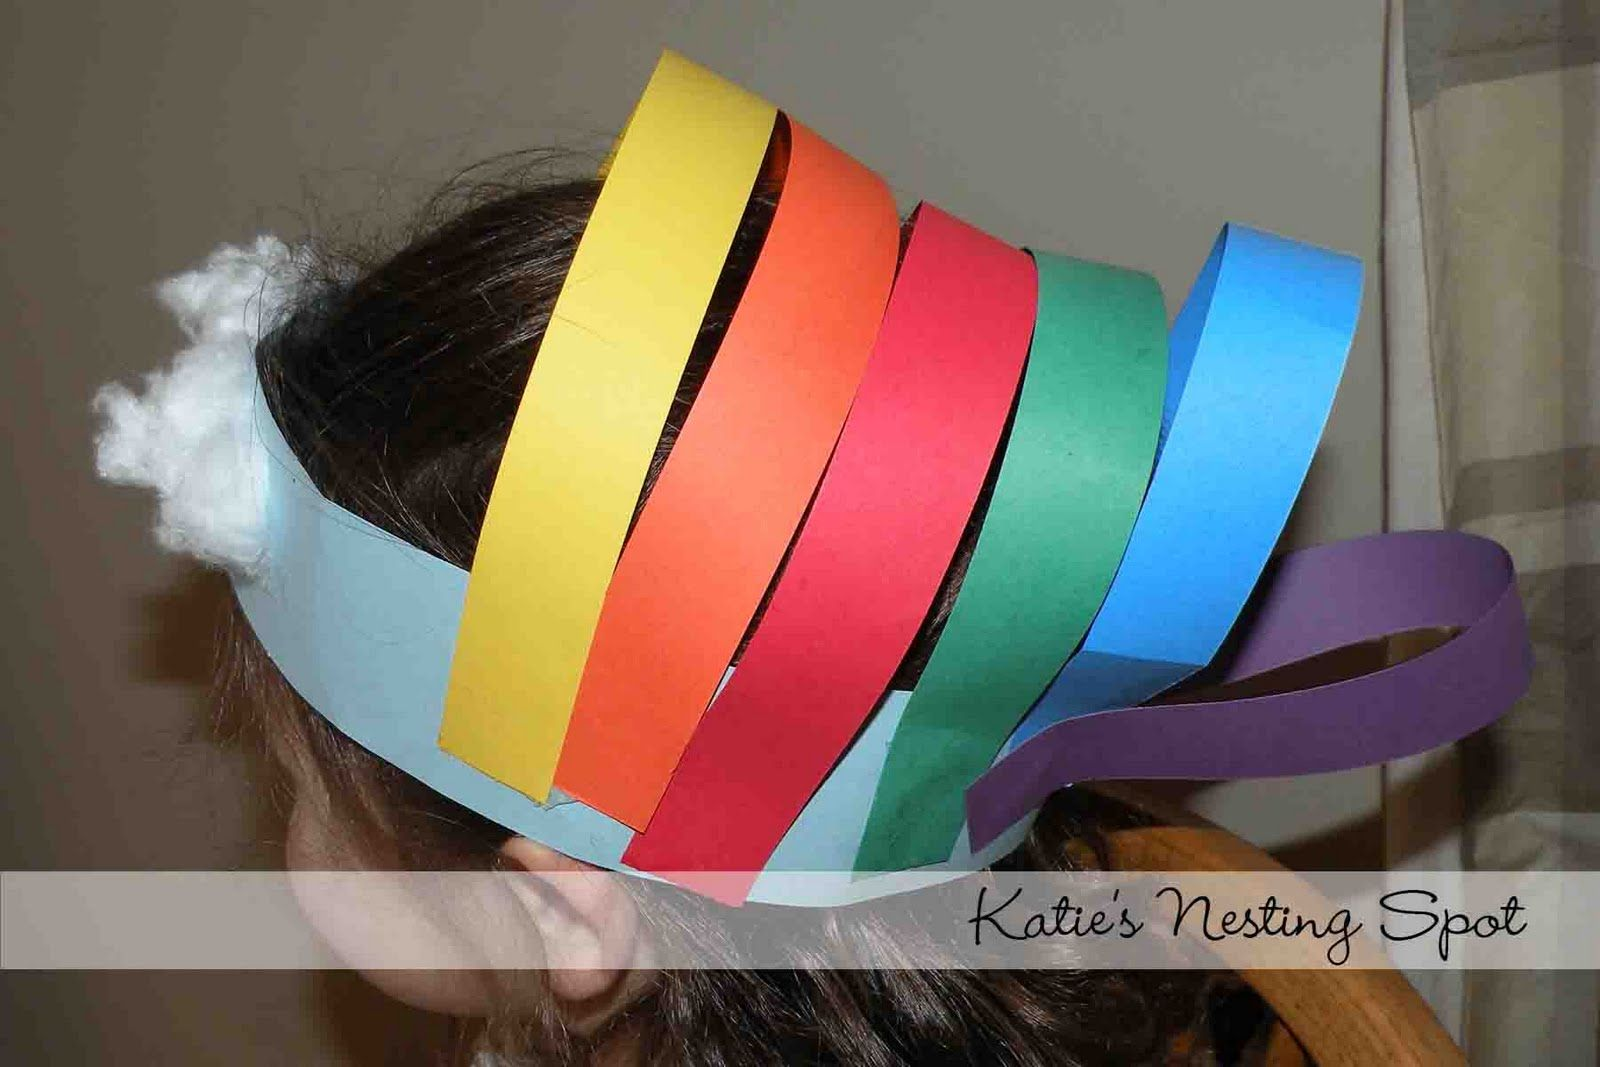 Katie S Nesting Spot Rainbows Everywhere Preschool Art